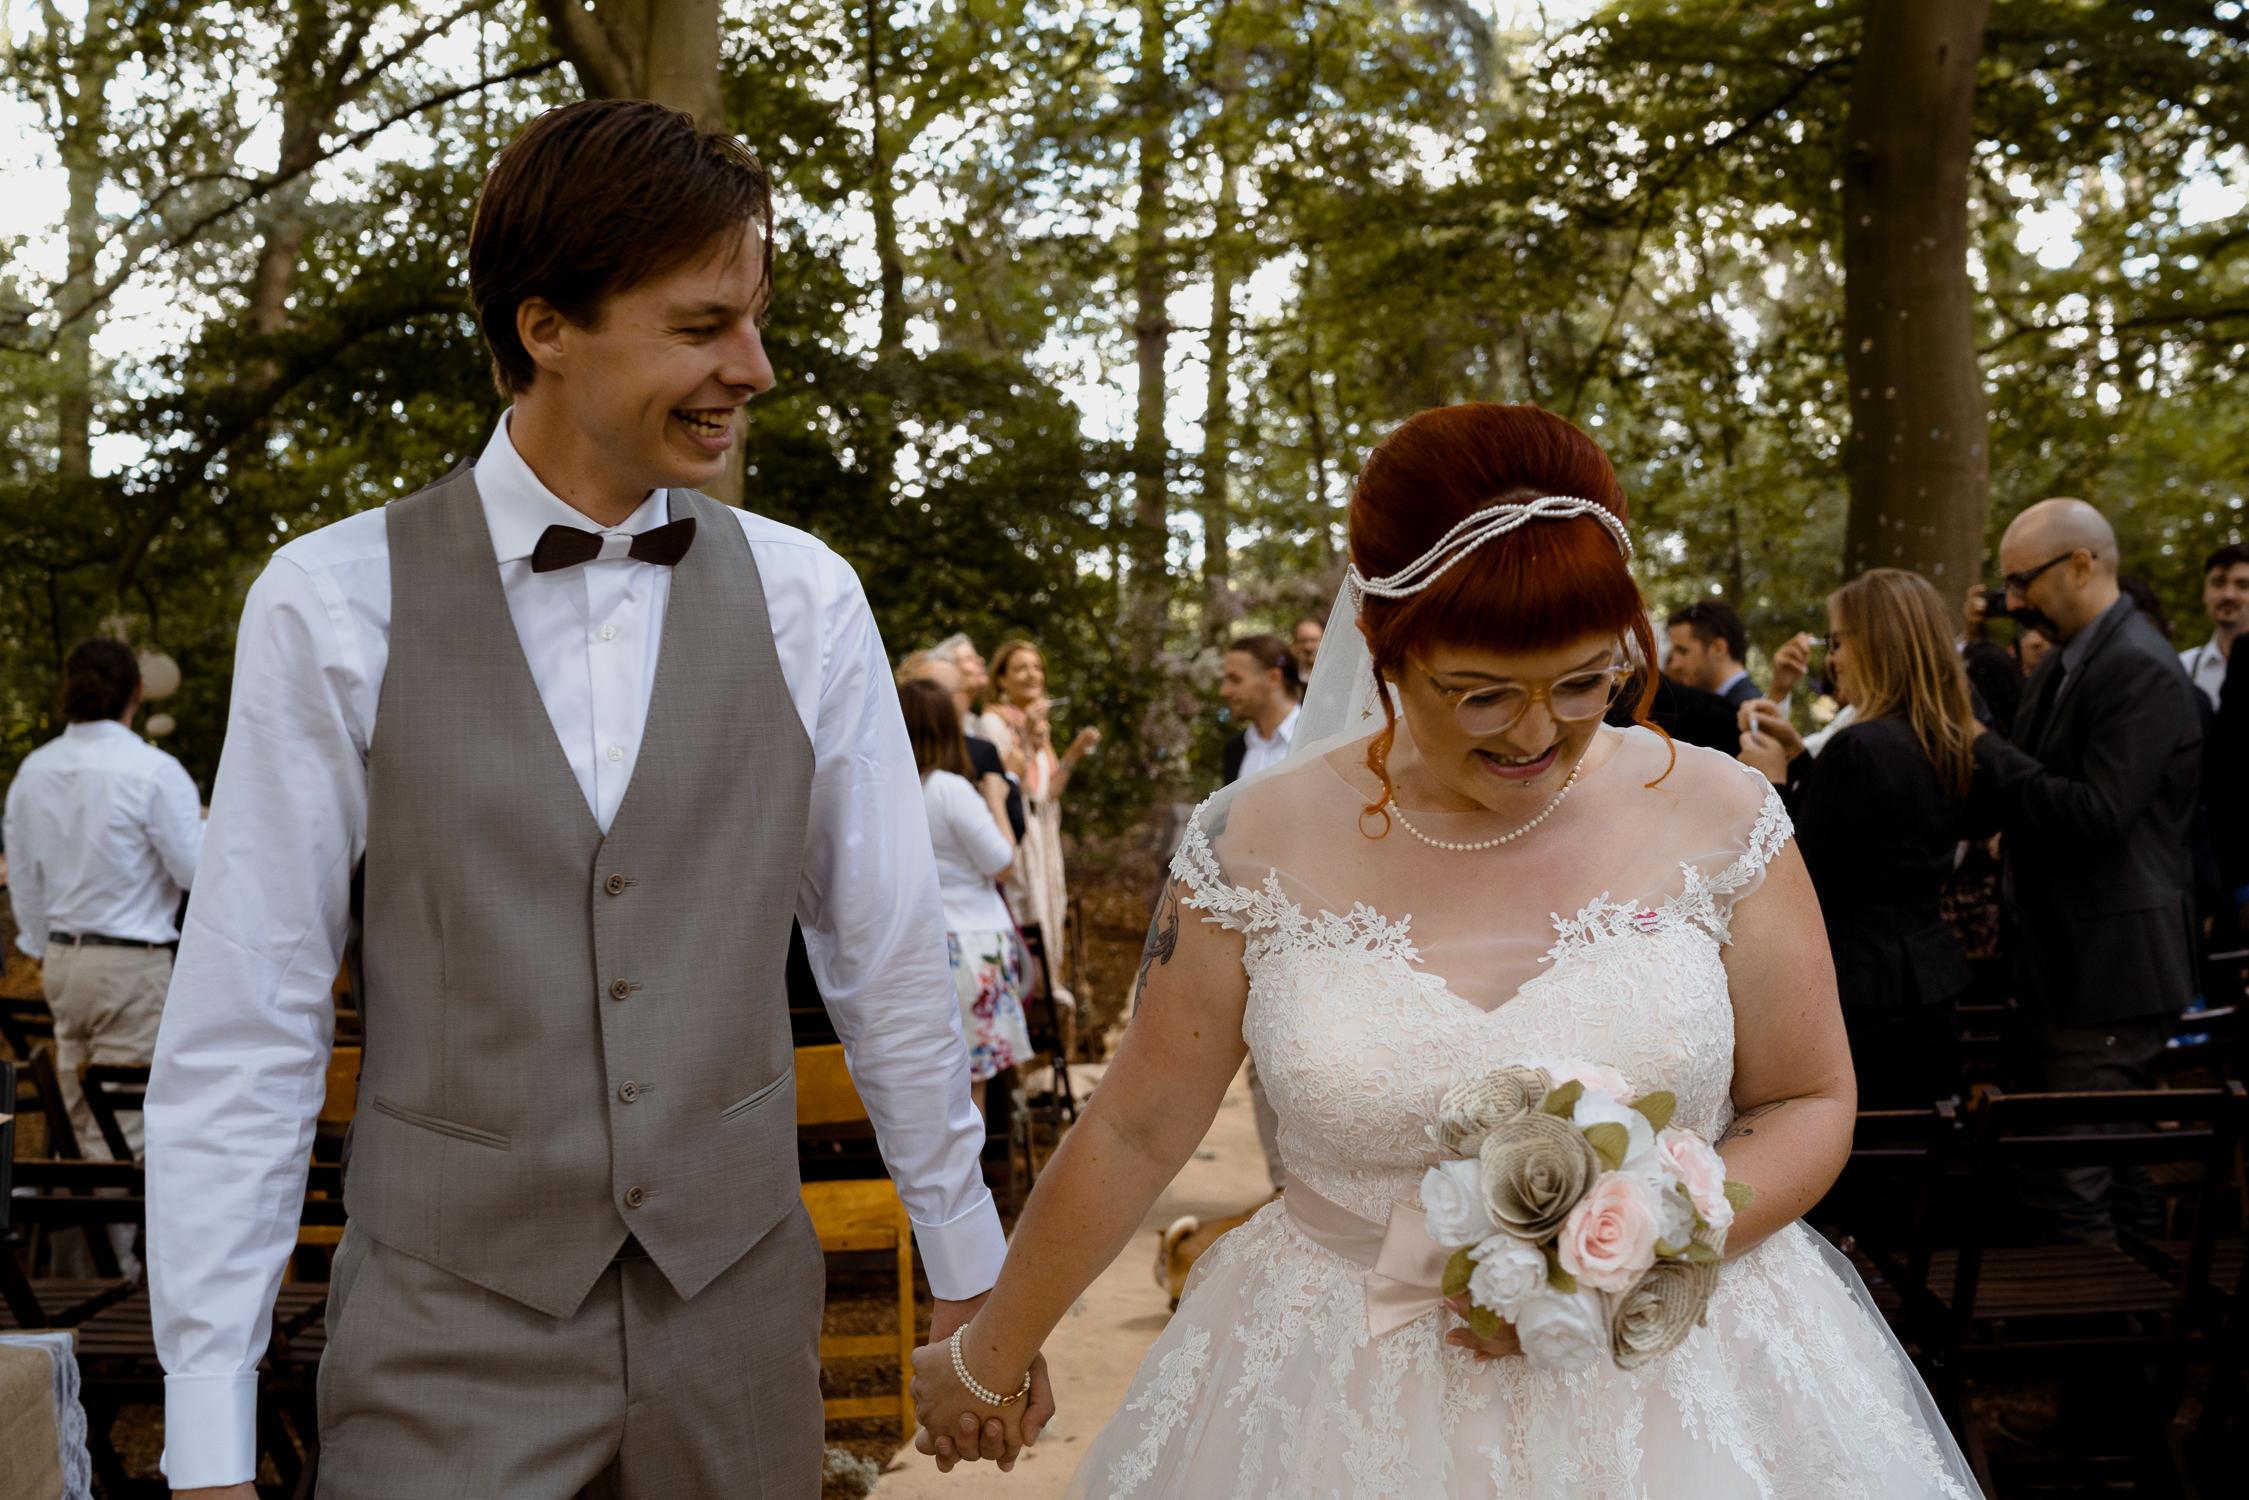 amsterdam-wedding-photographer-bruidsfotografie-trouwfotograaf-mark-hadden-Lucie-Luuk-120.jpg